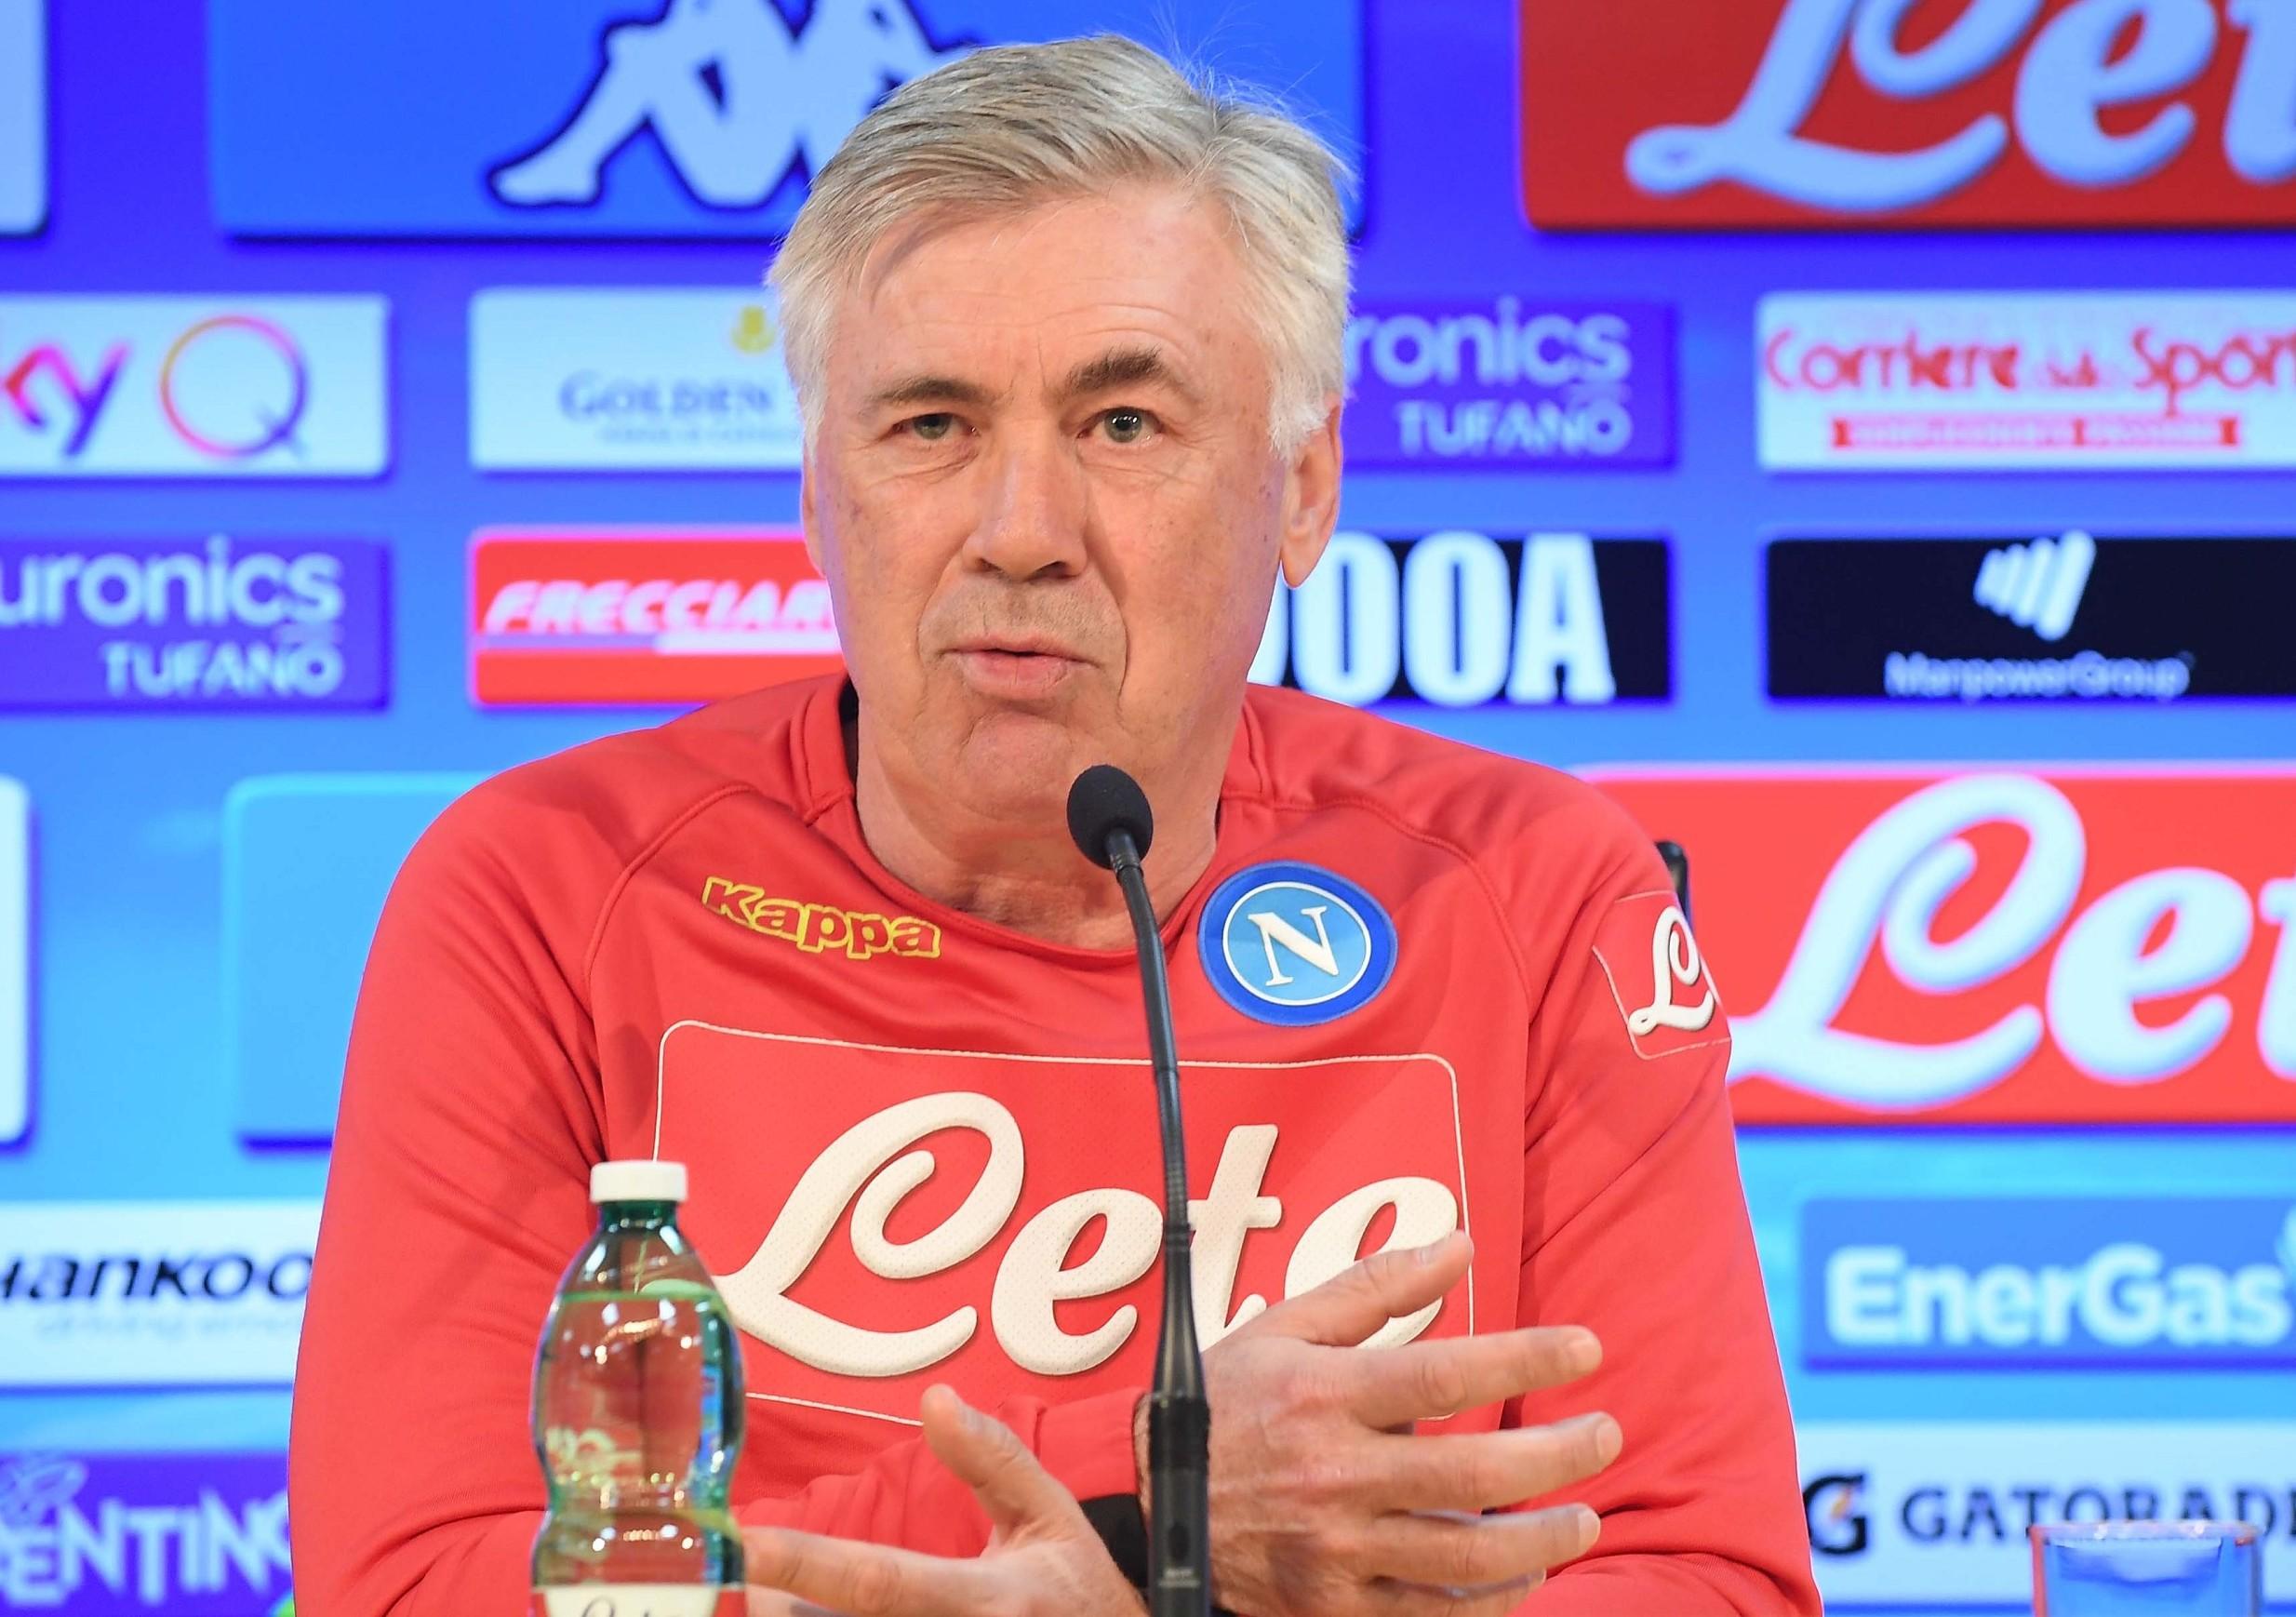 Napoli Sampdoria gratis live su siti web